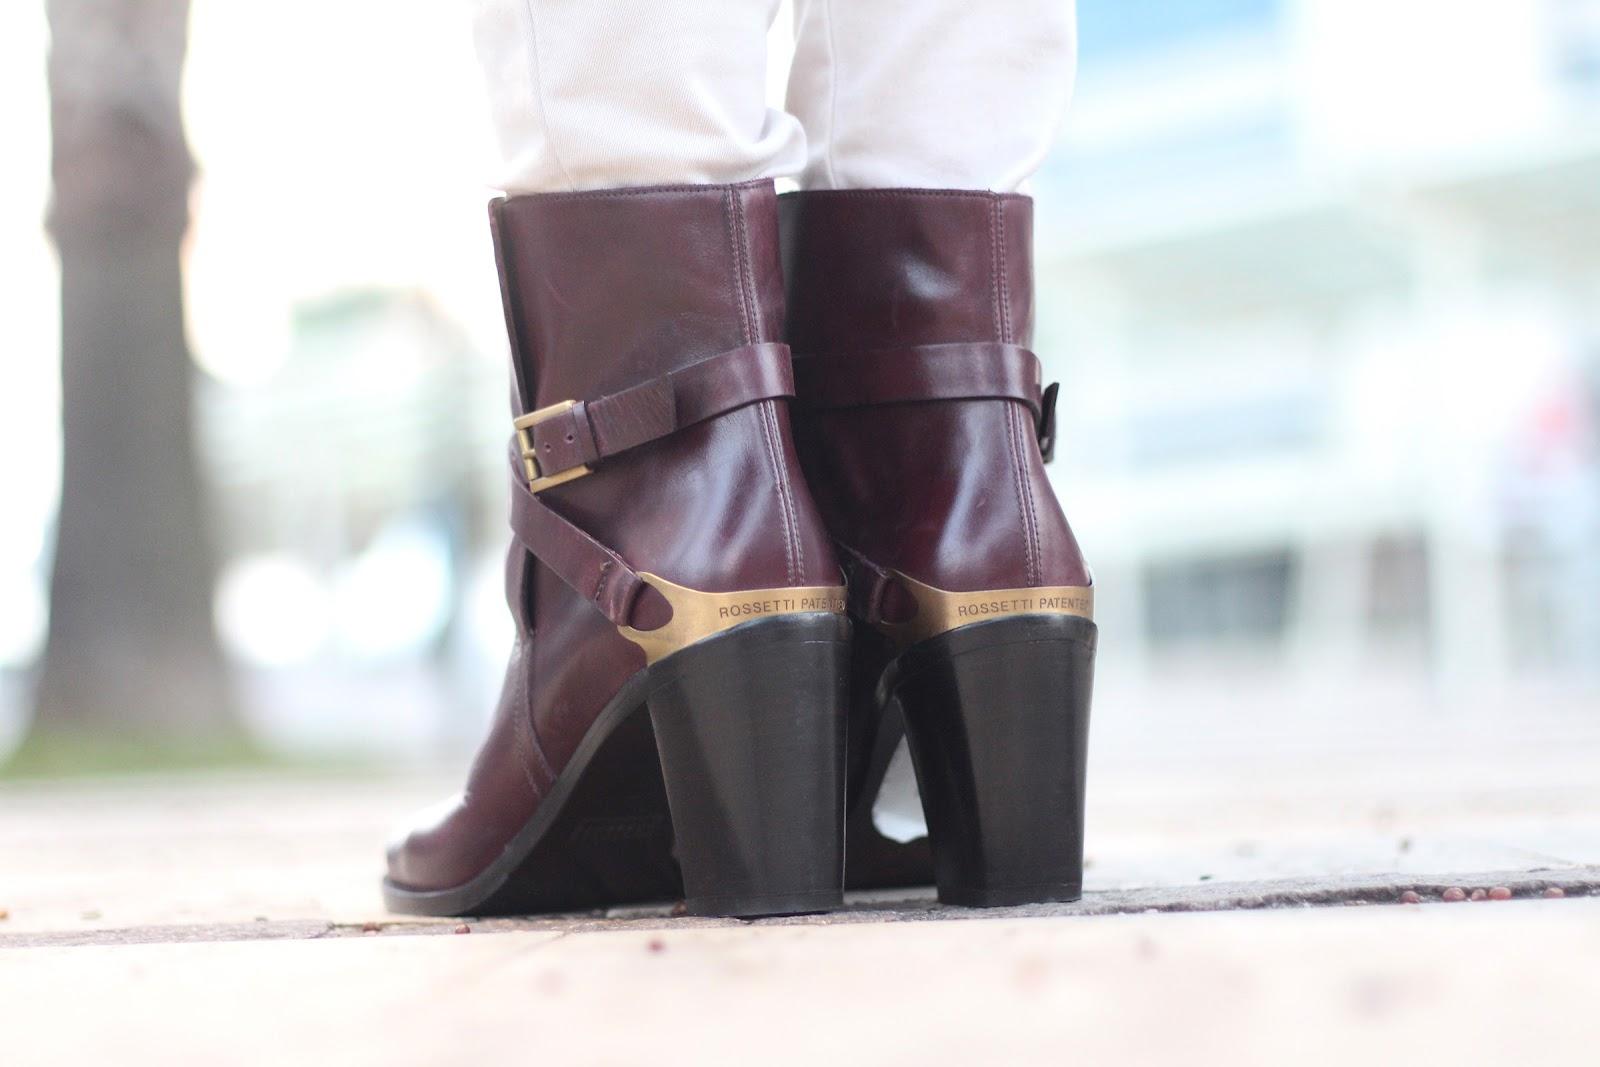 fashion moda style outfit fratelli rossetti shoes scarpe stivali boots bershka pants fur coat zara pelliccia gucci bag borsa wavy hairstyle headband hat pescata italy talia